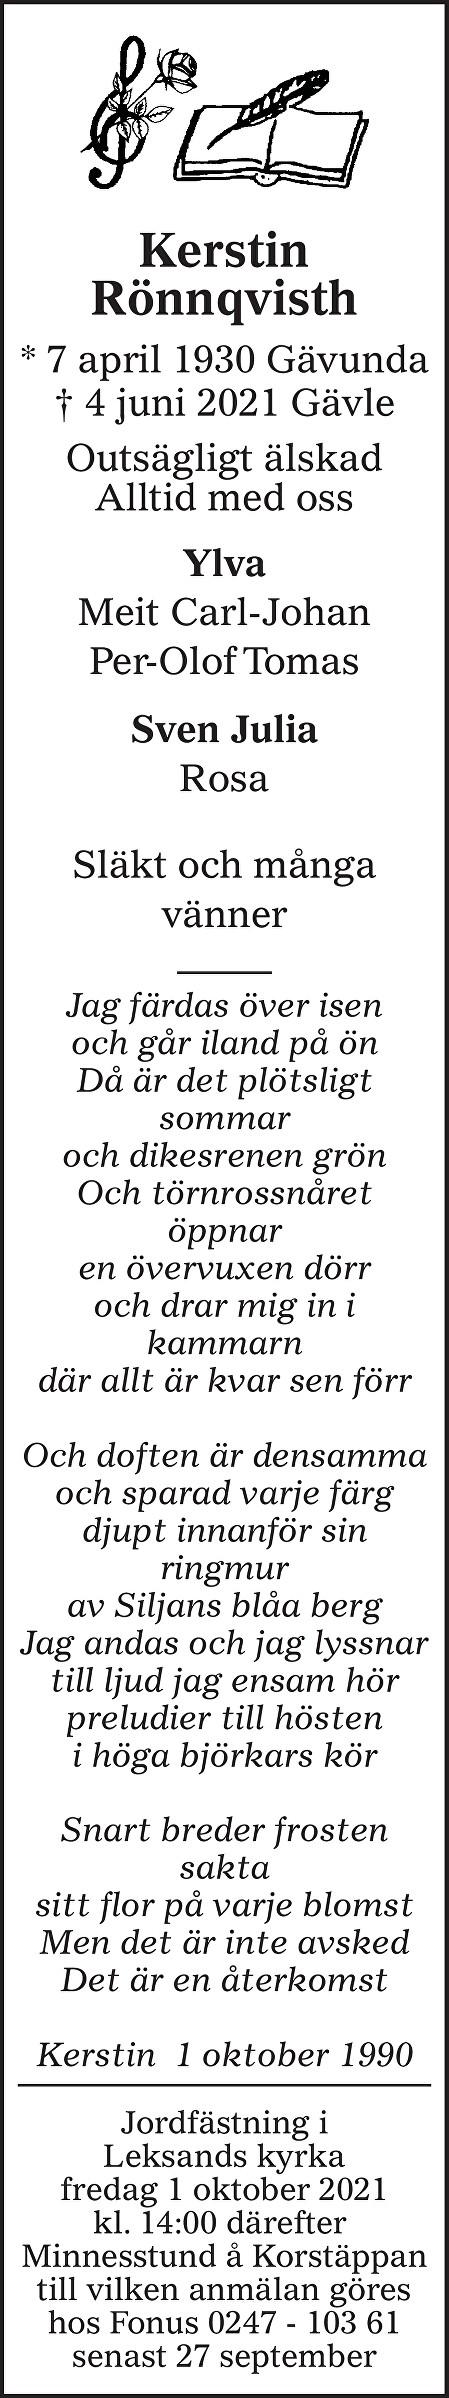 Kerstin Rönnqvisth Death notice